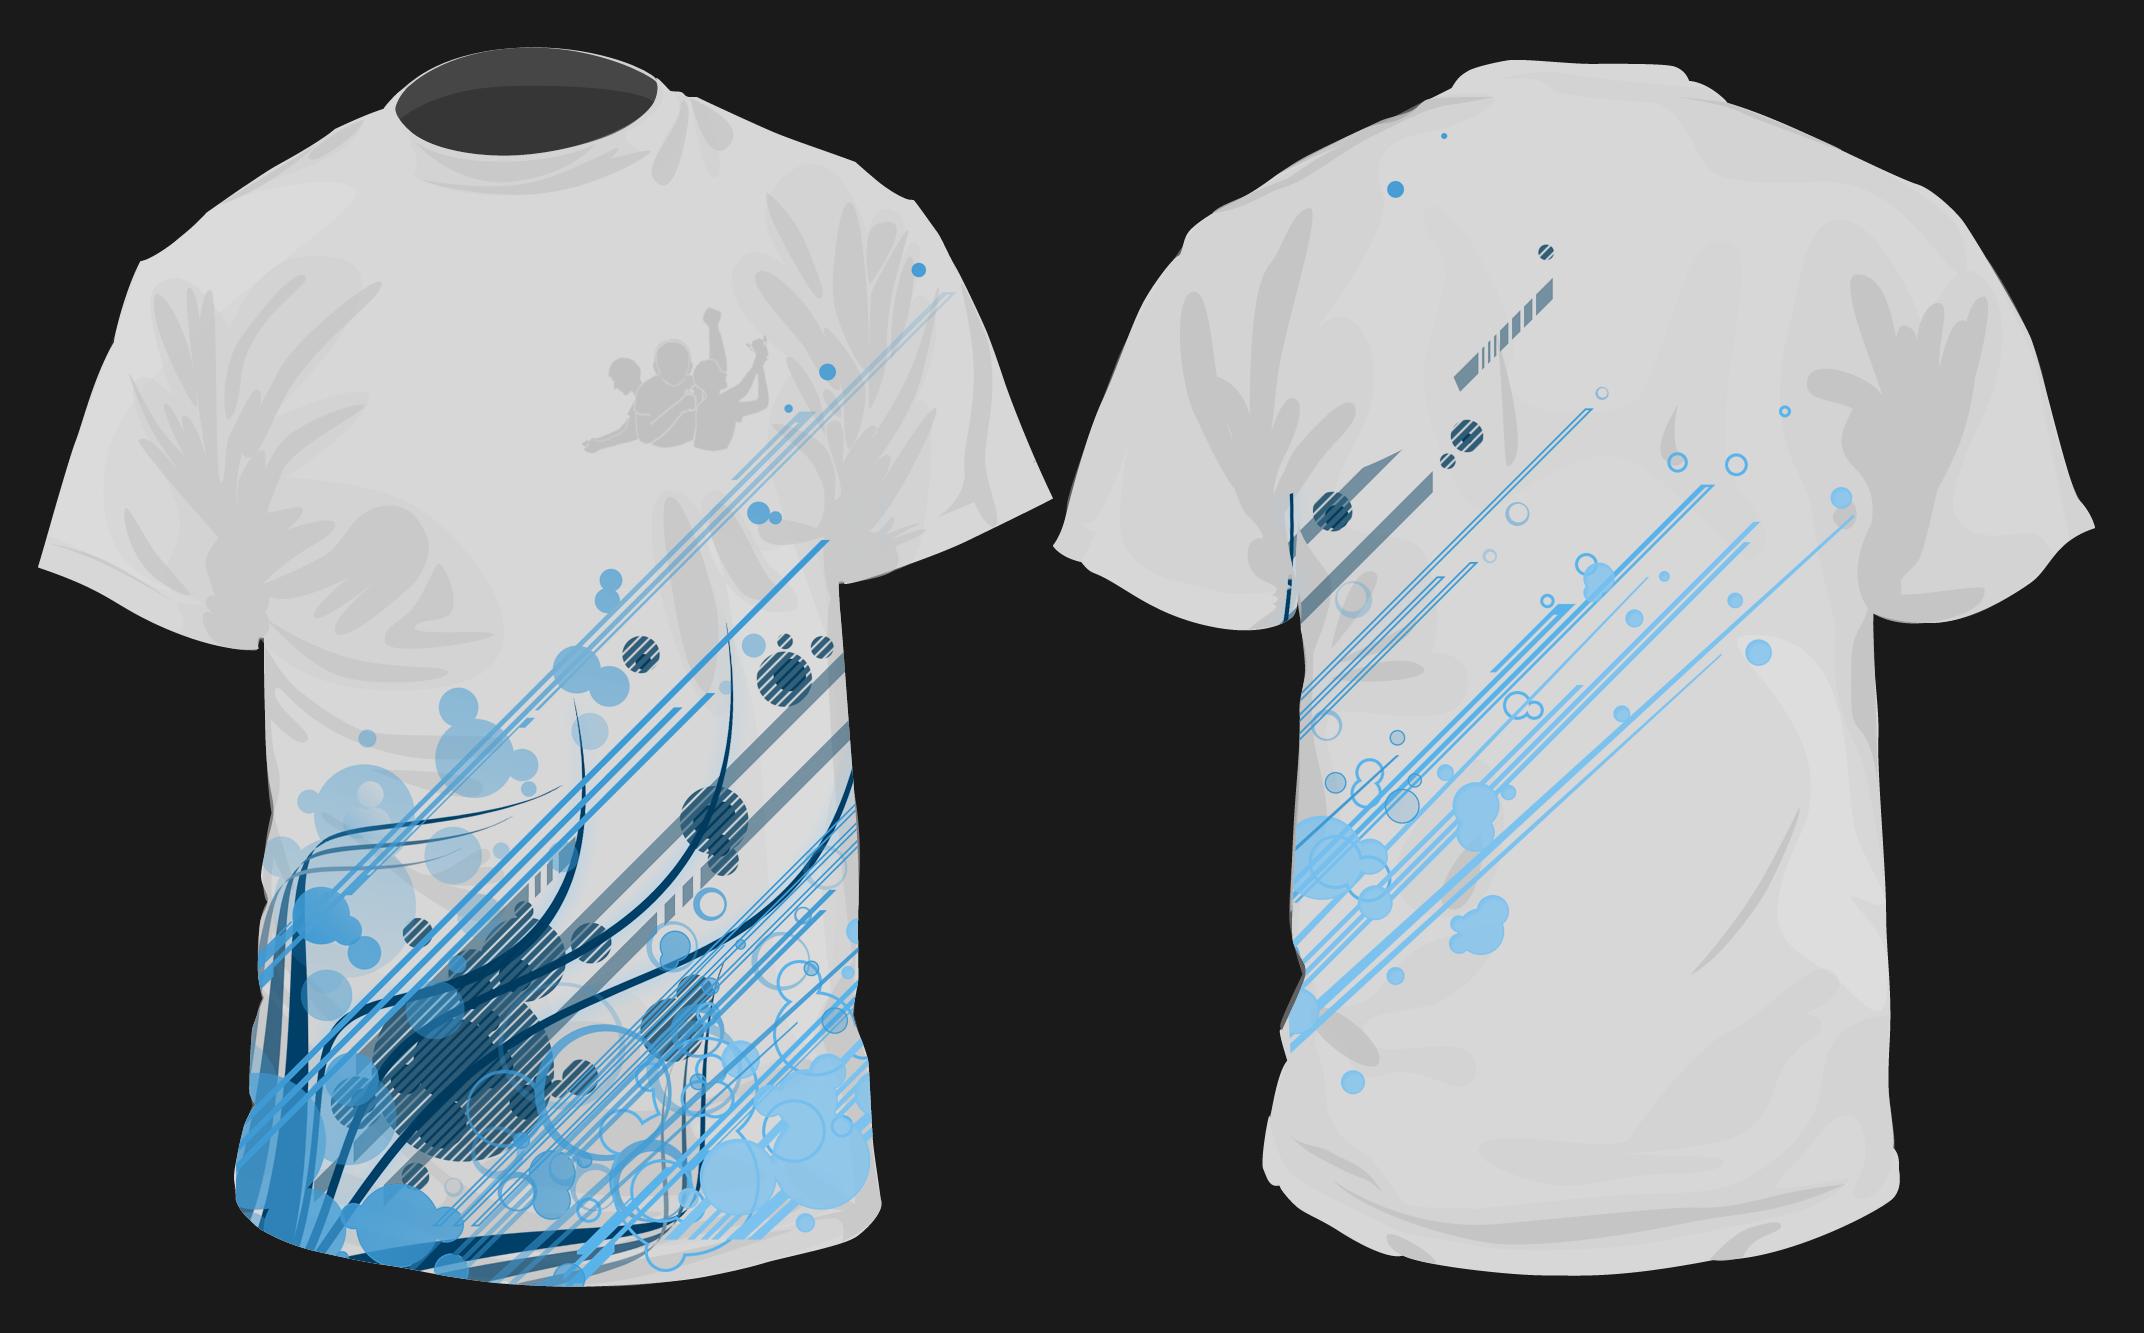 Find A Designer Online T Shirt Designs 2012 Tshirt Design